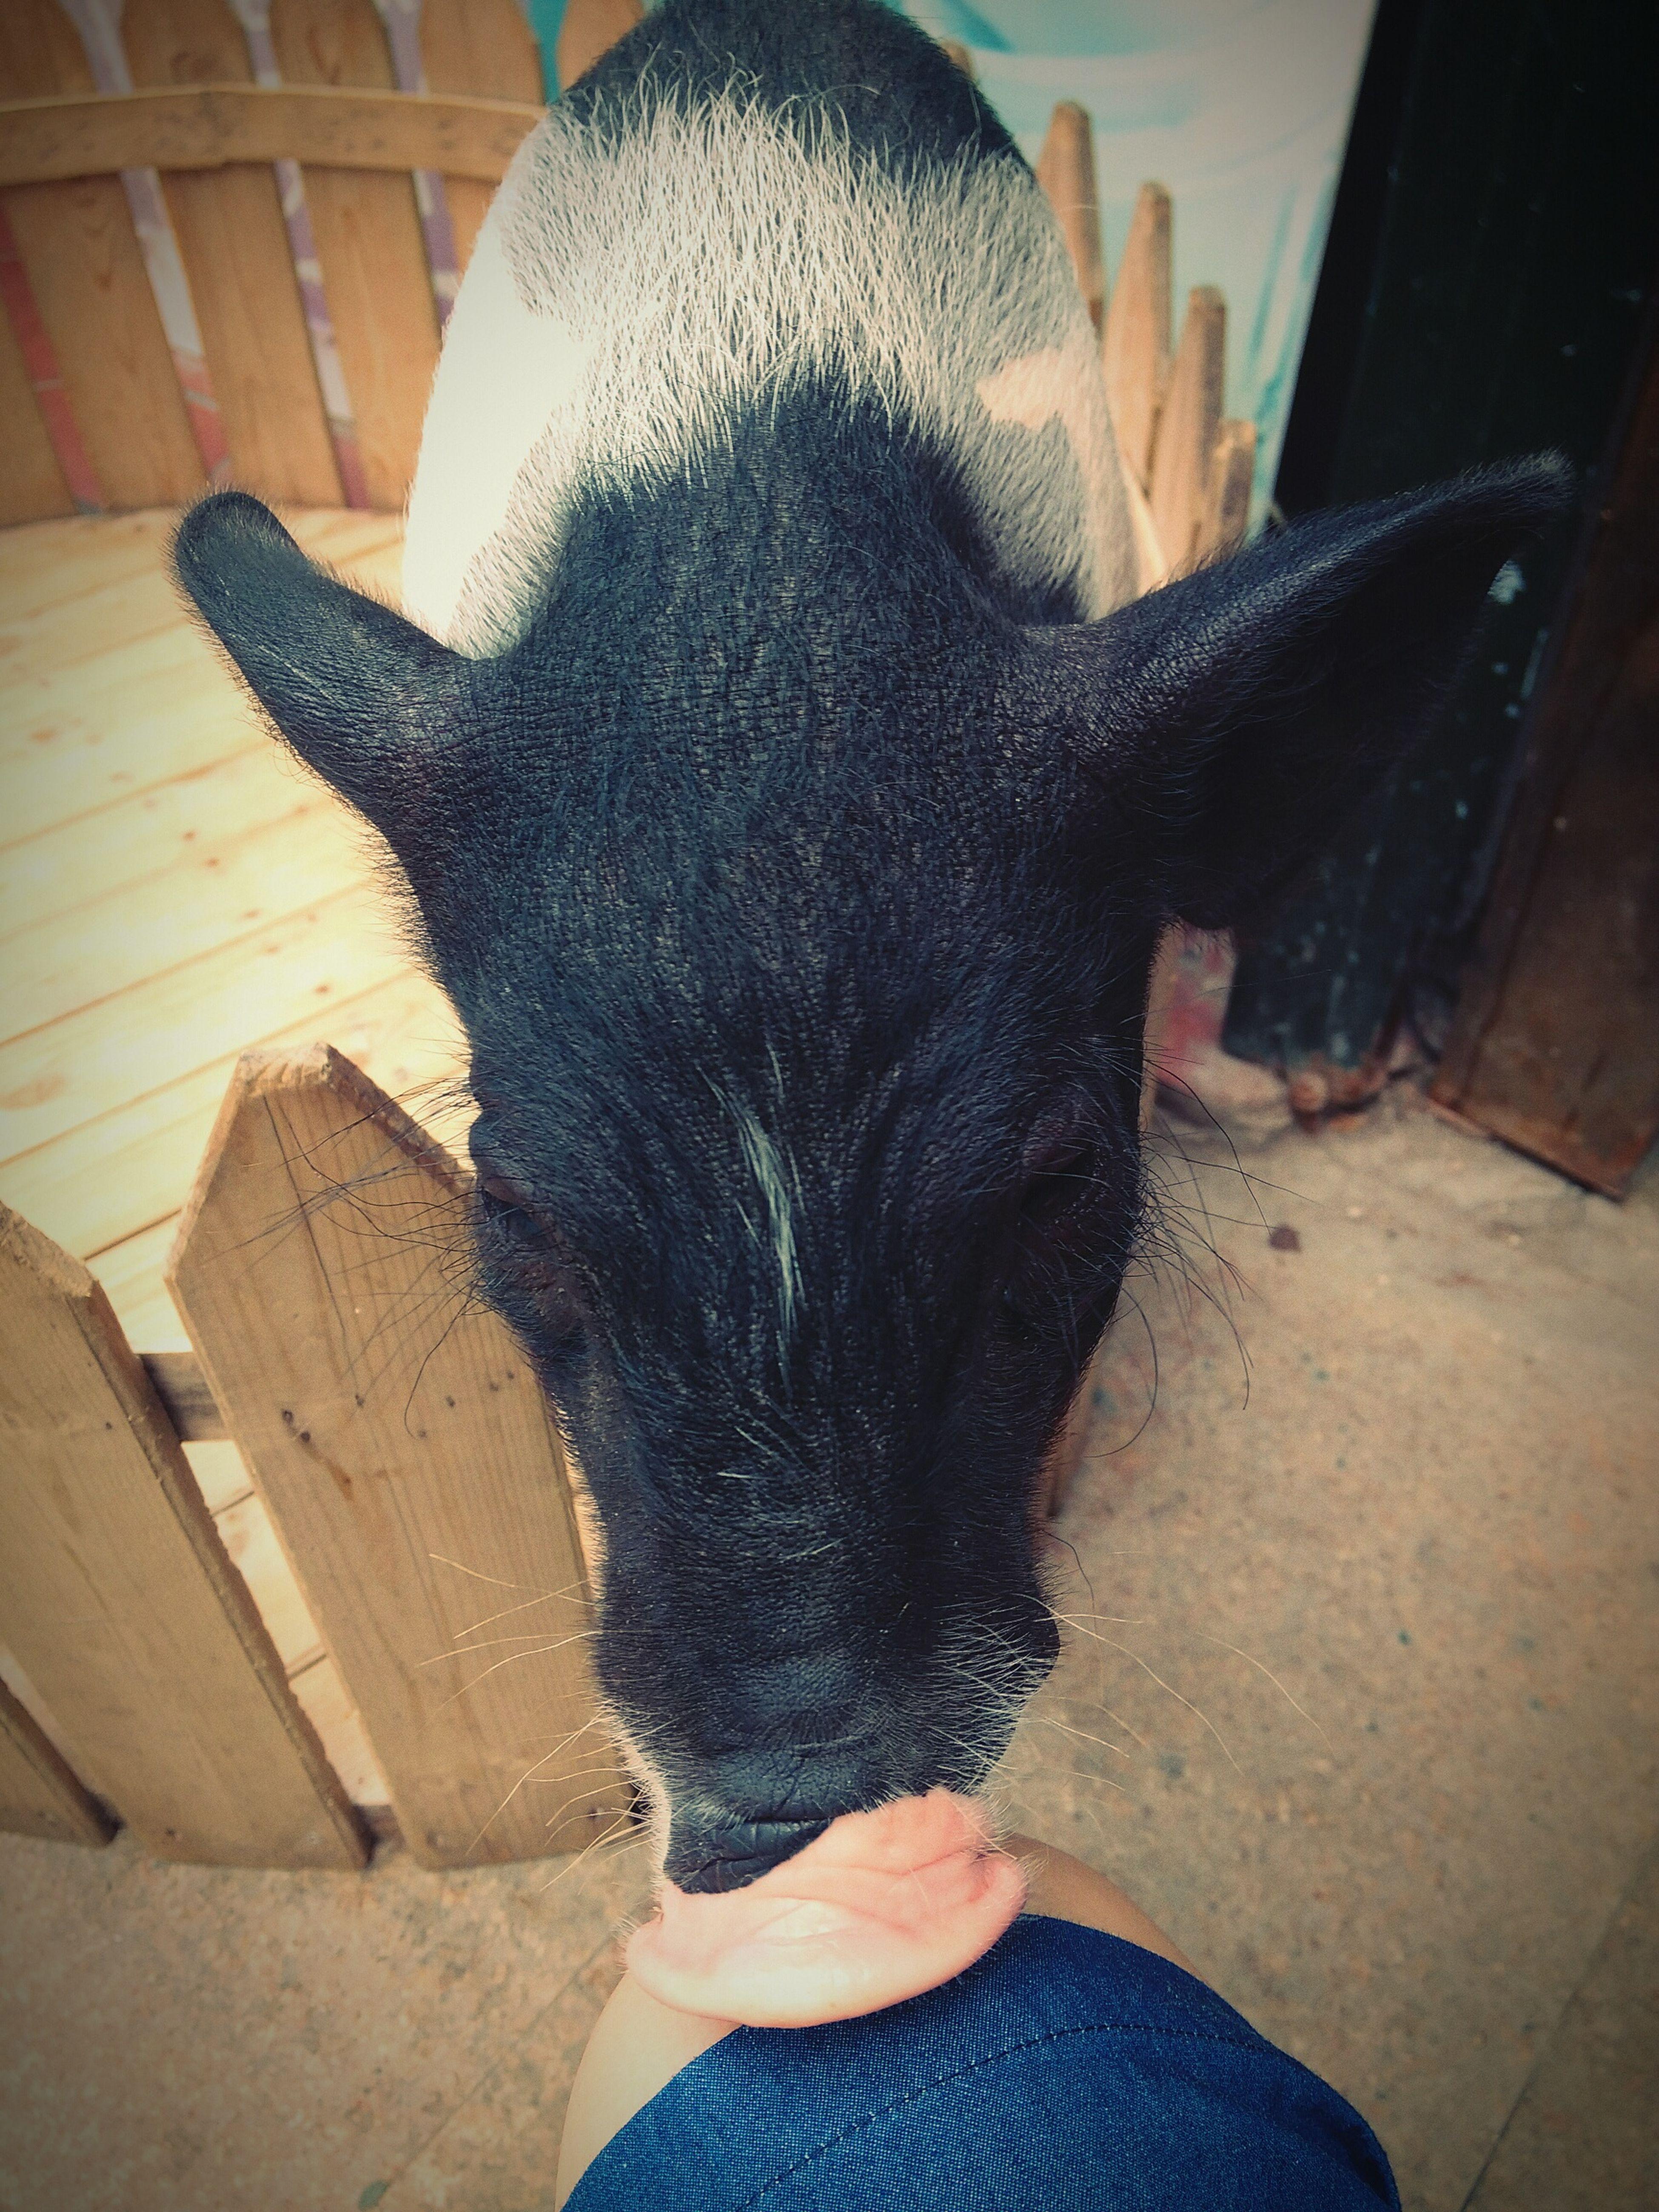 Pig Cute♡ Beautiful Life Animal 2015  Xiamen Laoyi